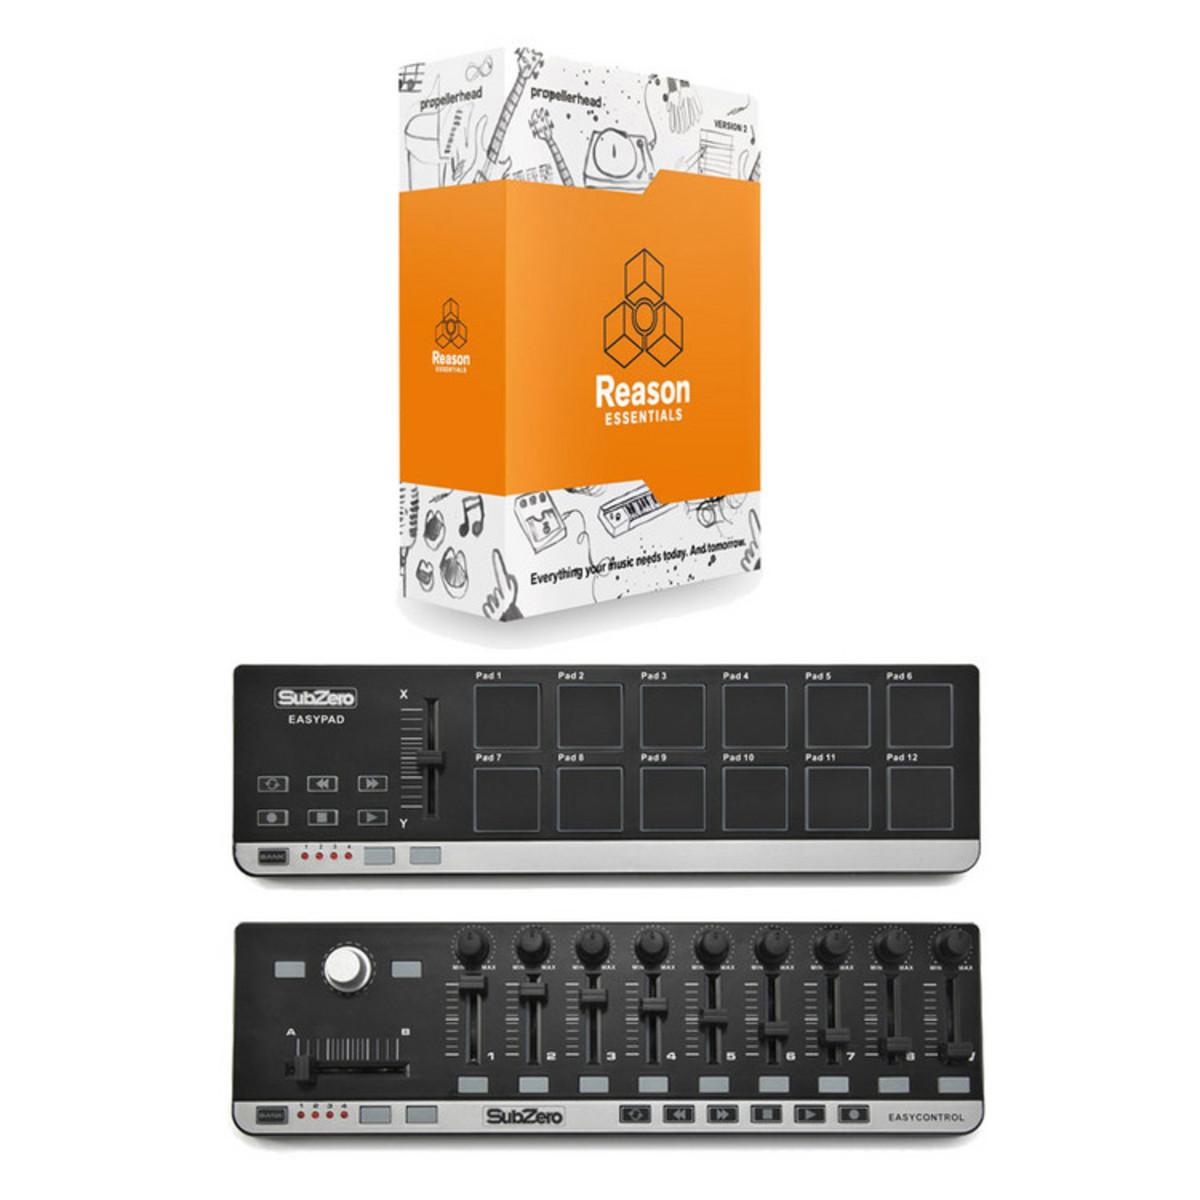 Propellerhead disco reason essentials 2 laptop produttore for Produttore di blueprint virtuale